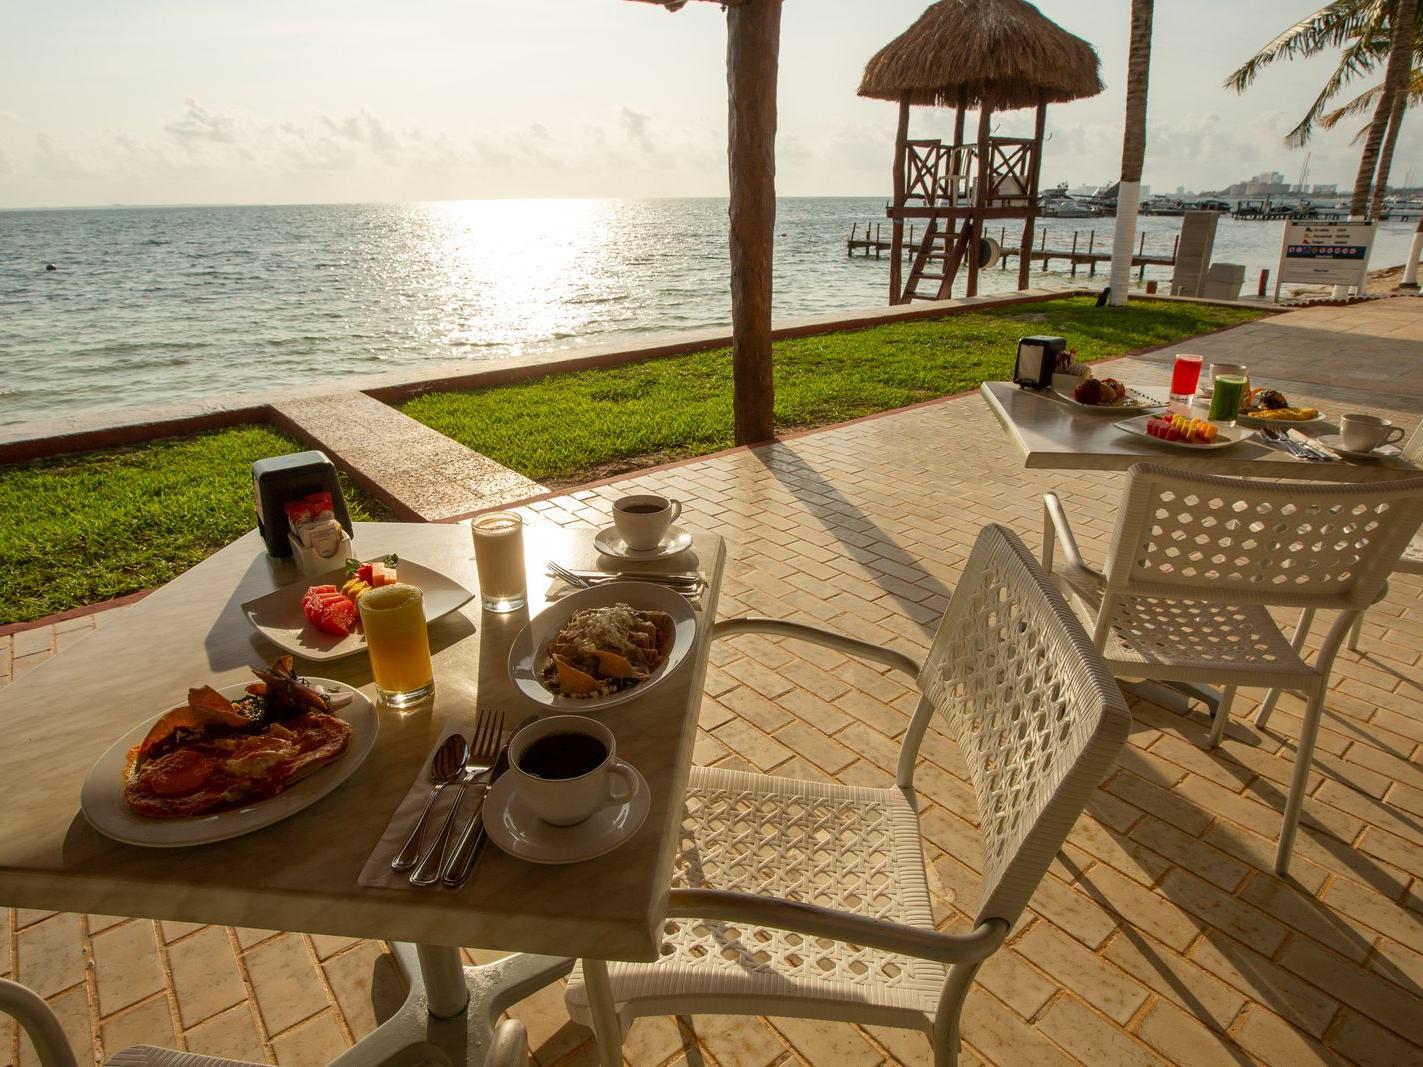 breakfast on two tables outside